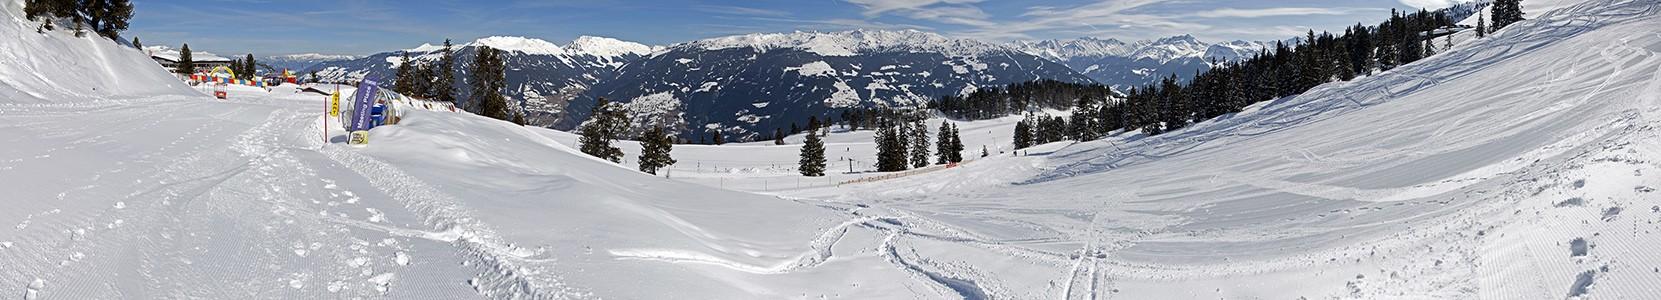 Hochzillertal Kitzbüheler Alpen